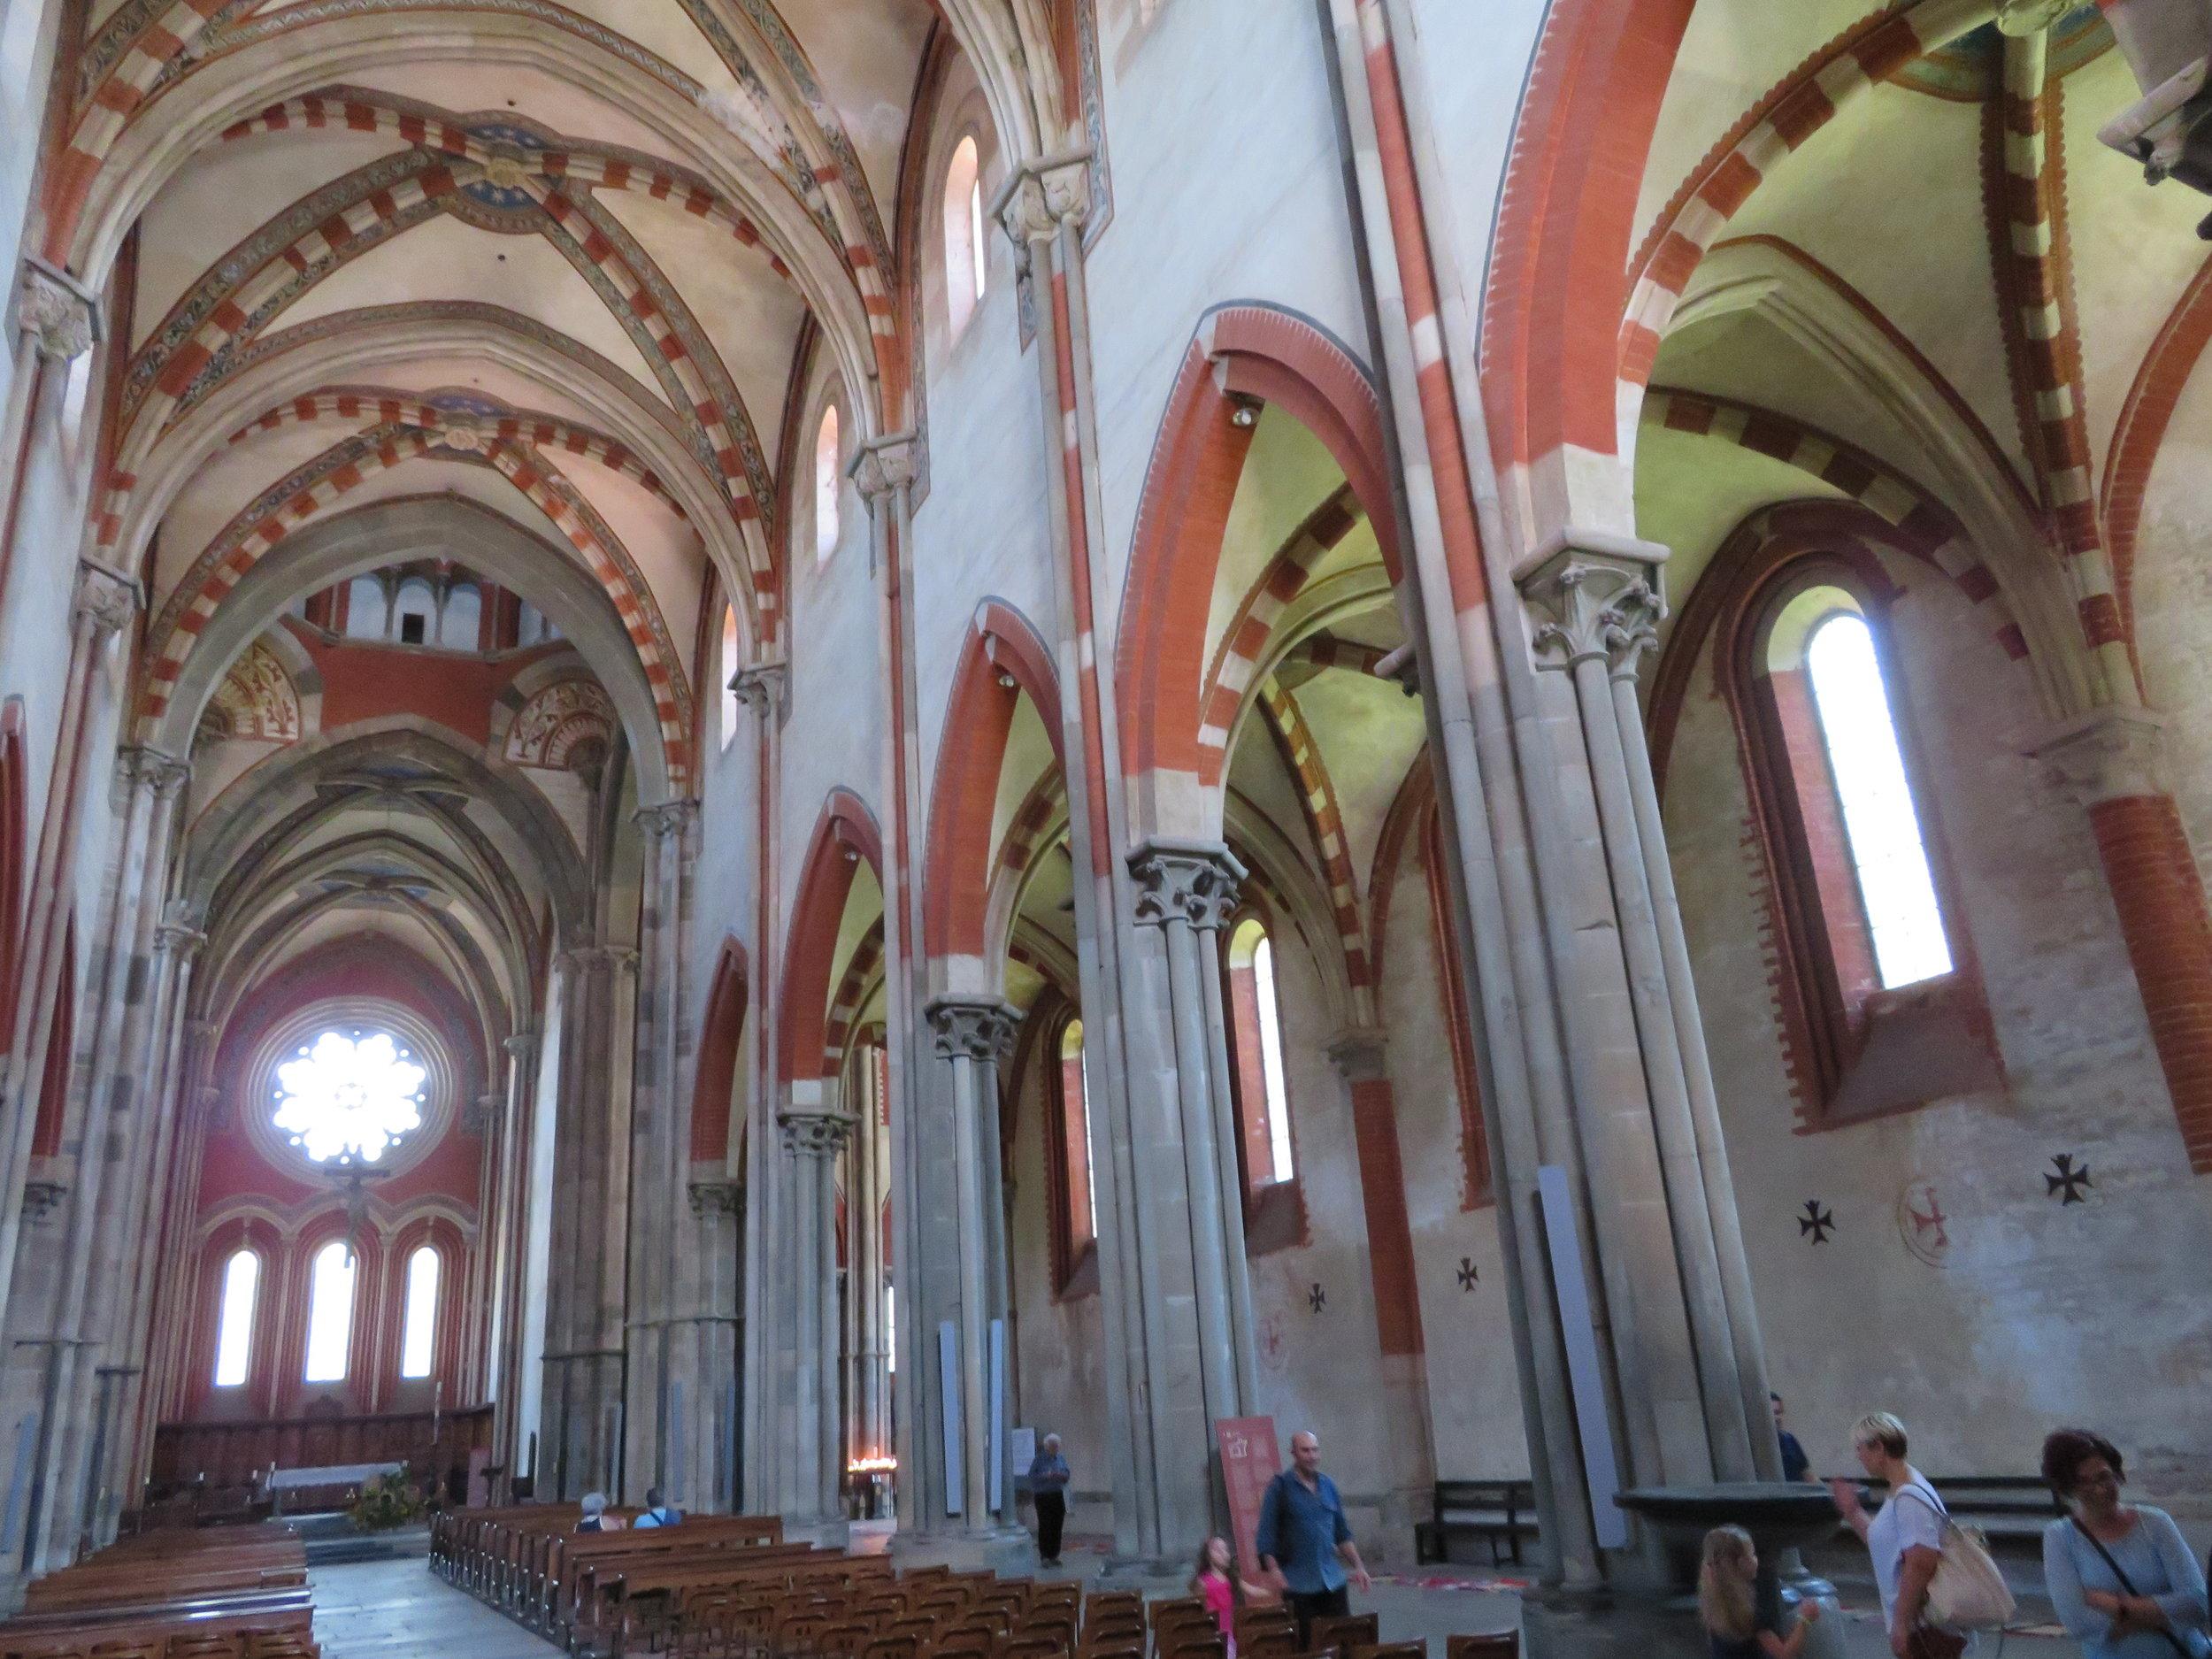 Cistercian red & white interior